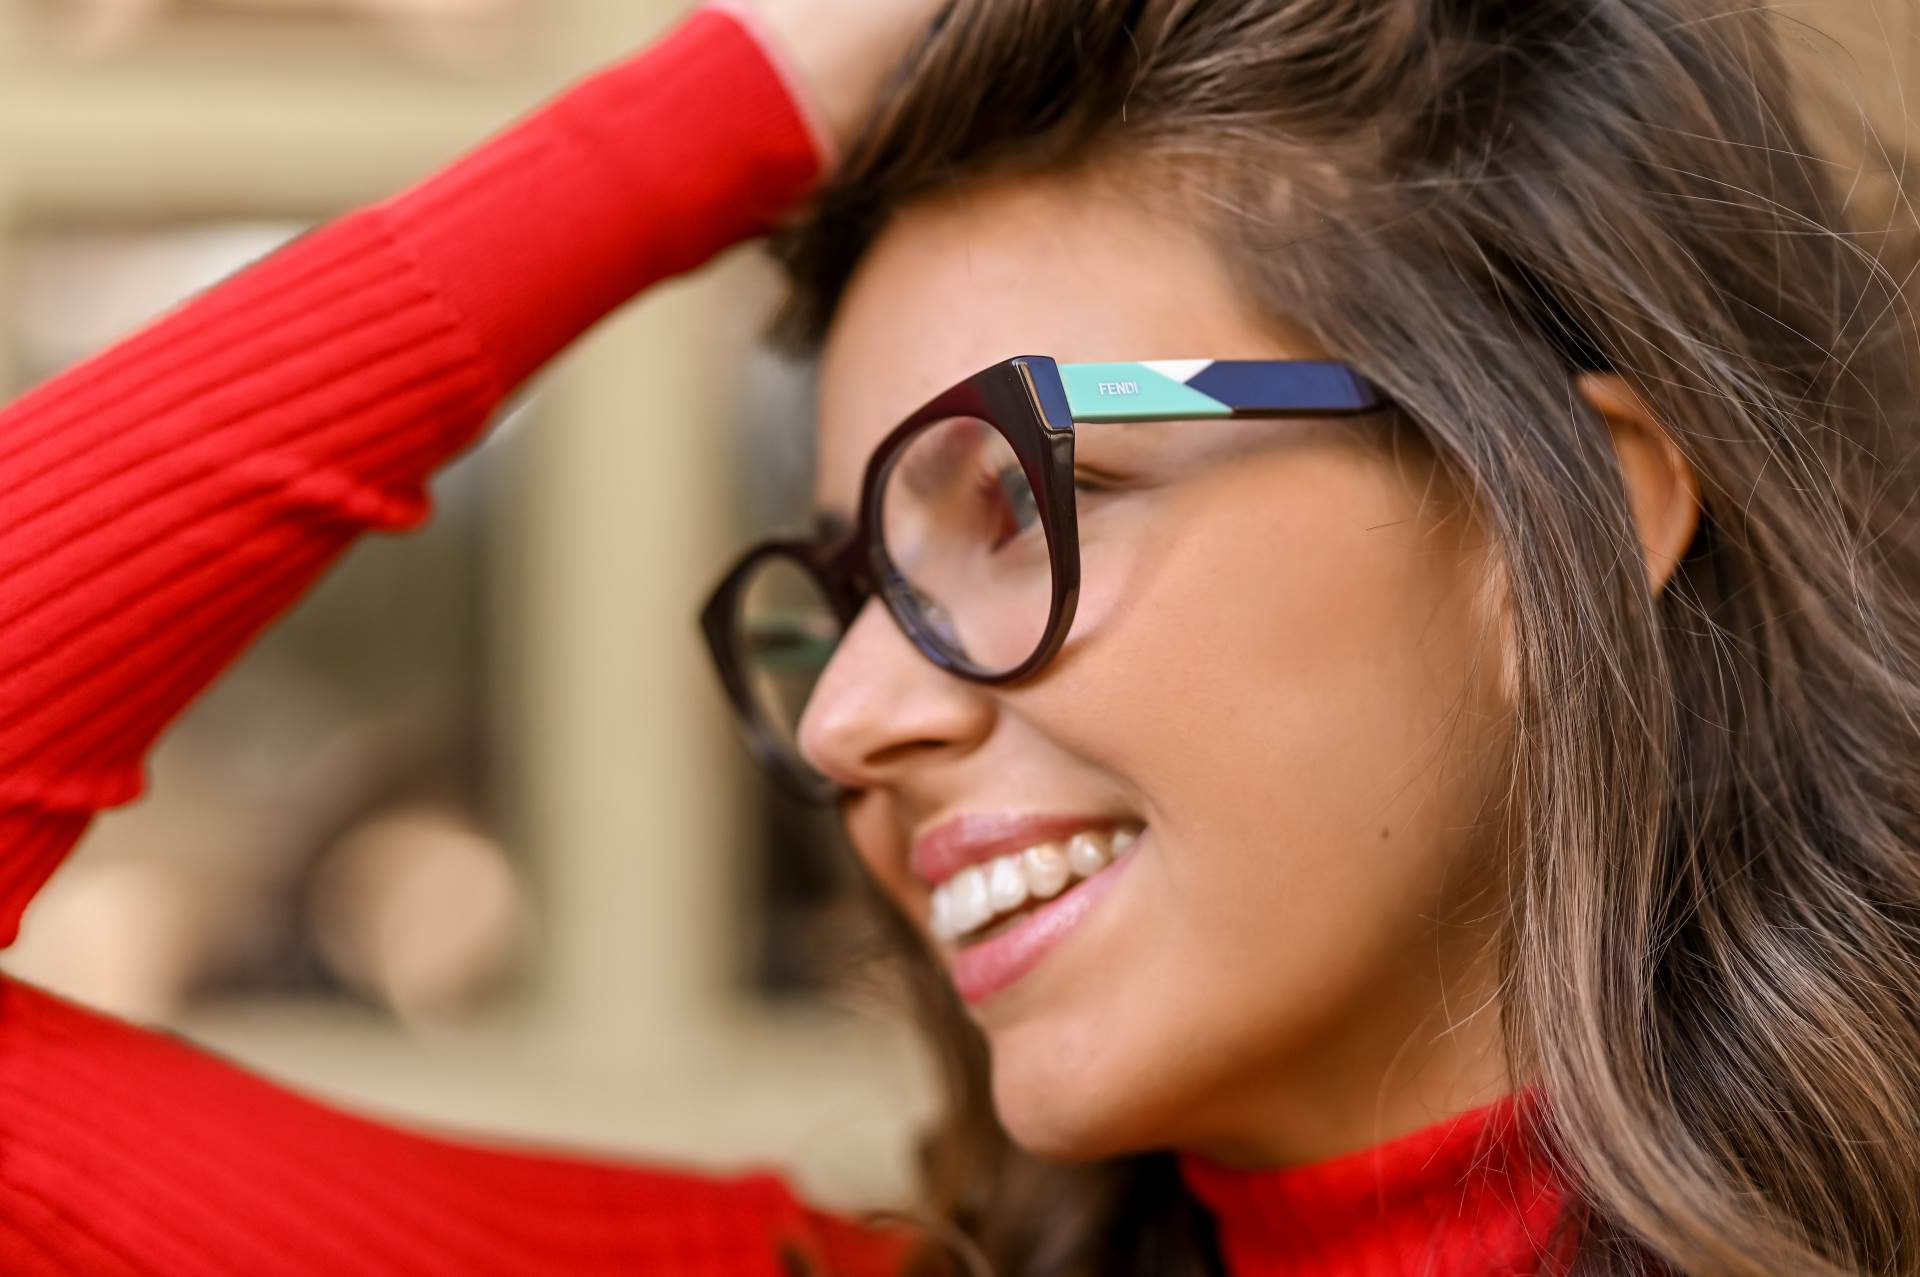 Naočale Fendi (Optotim) 2076,88 kn -30% 1453,82kn